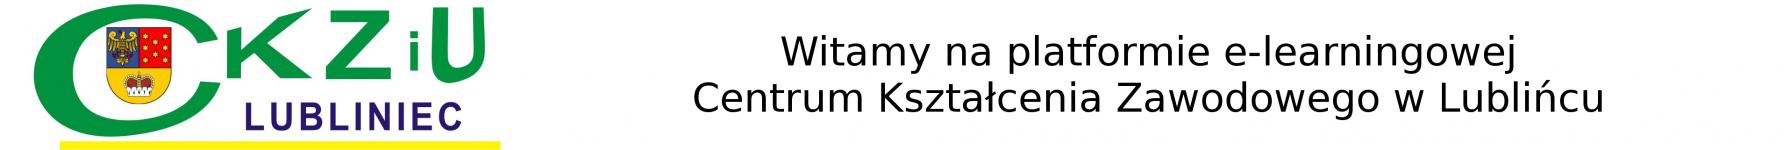 Platforma e-learningowa CKZiU